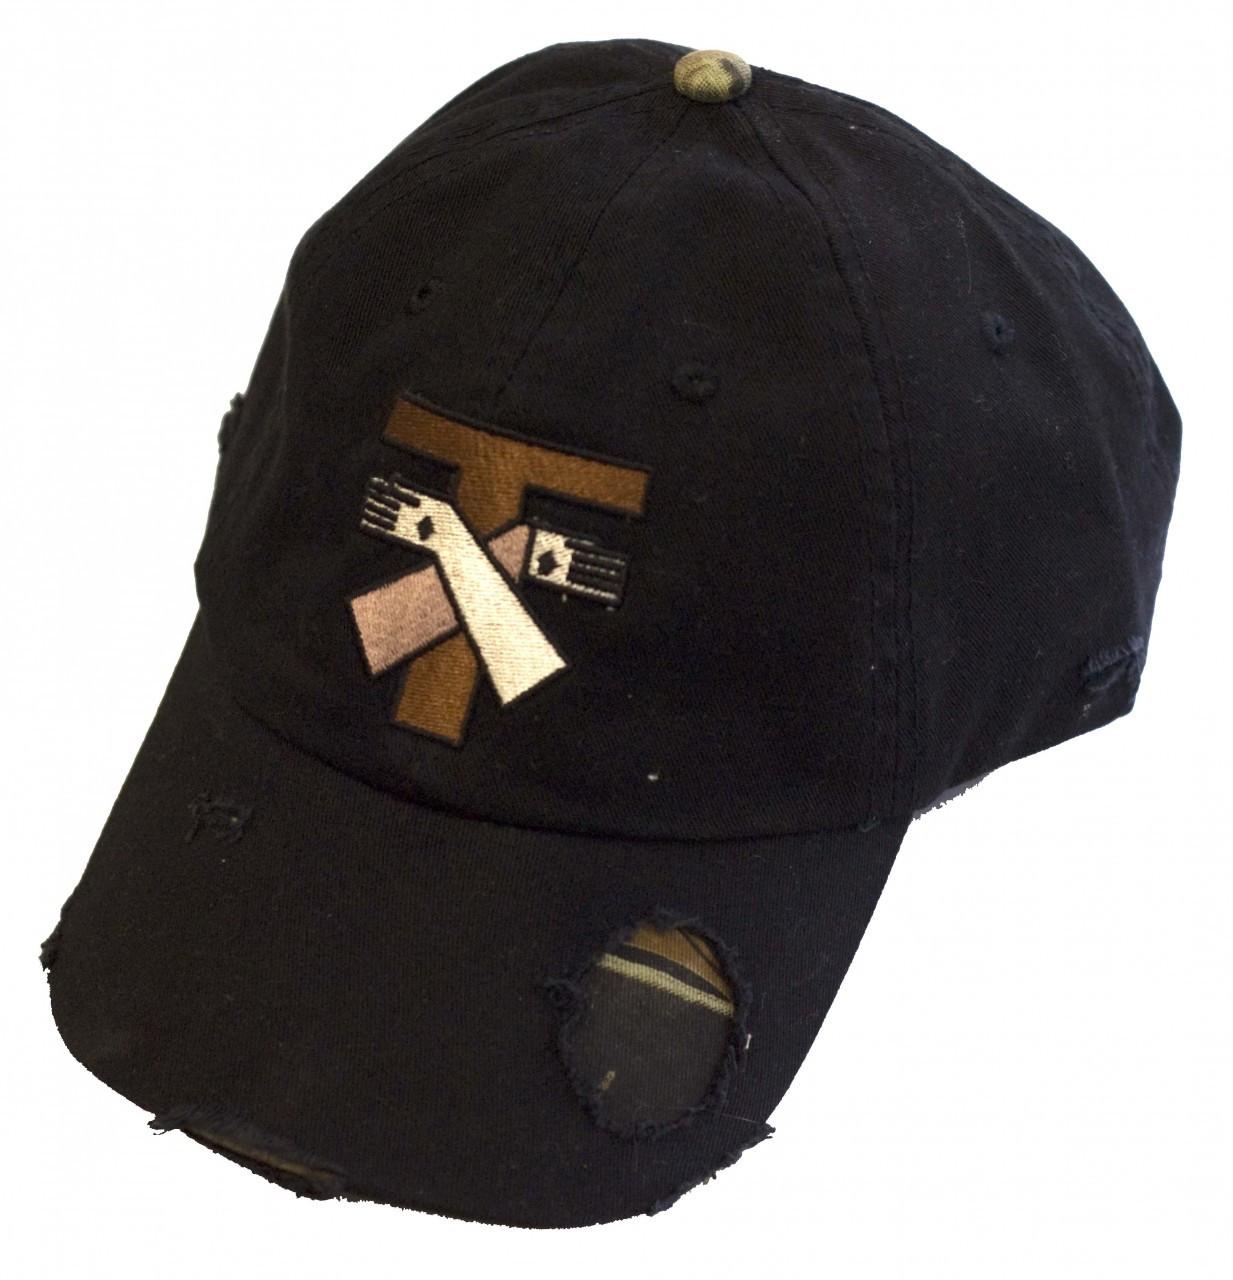 2c3c761e1c6 Jesus and St. Francis Tau Cross Distressed Black Hat - Catholic to ...